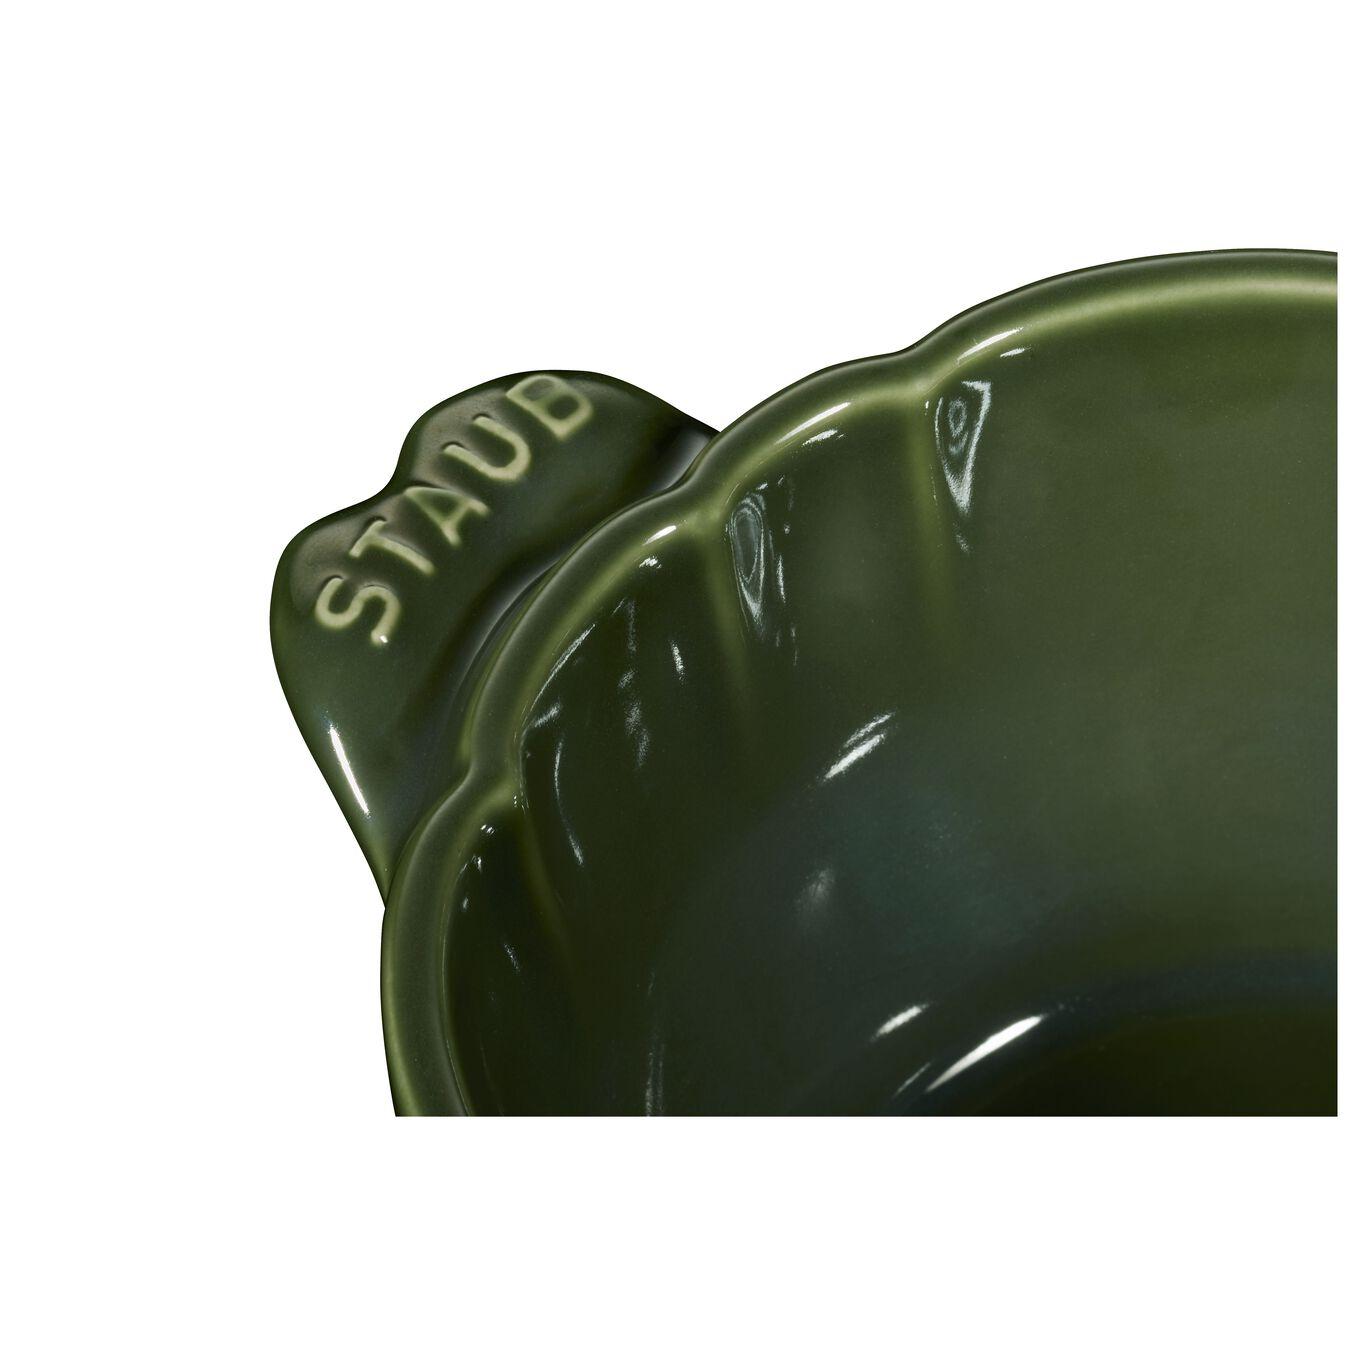 16-oz Petite Artichoke Cocotte - Basil,,large 3